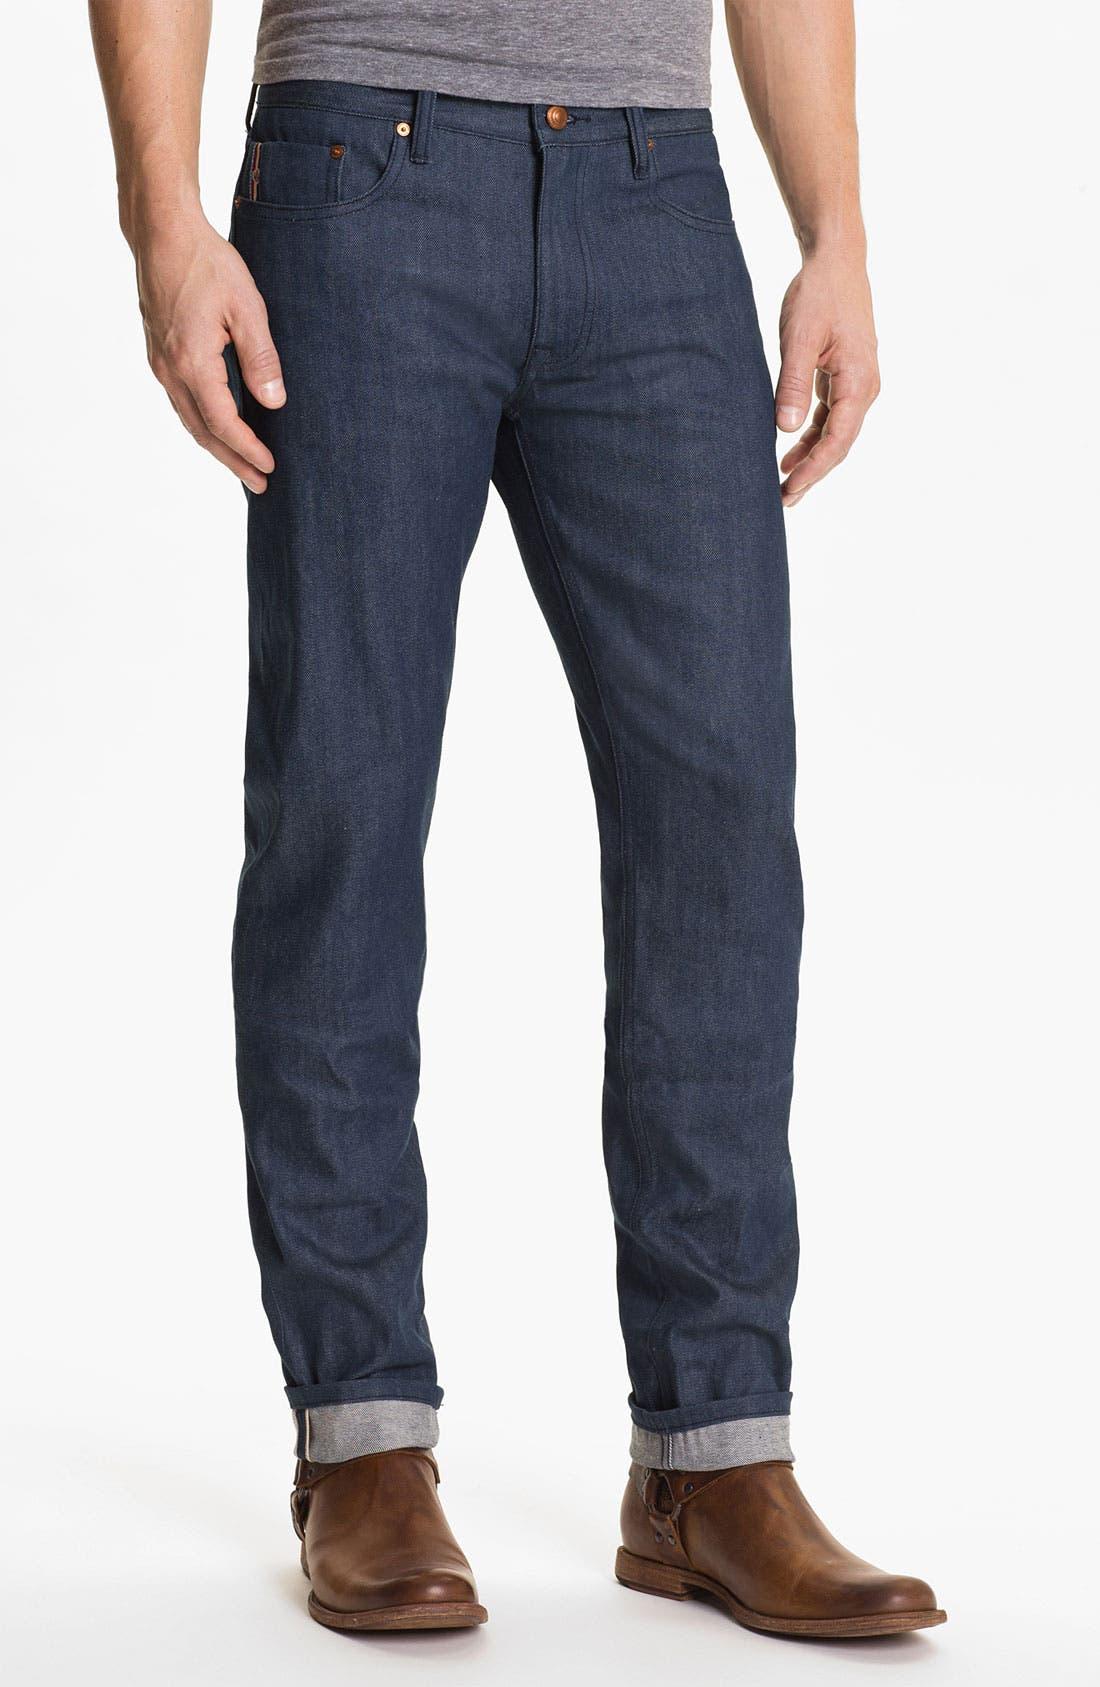 Alternate Image 2  - Denim & Leathers by Andrew Marc 'Ocean' Slim Straight Leg Raw Selvedge Jeans (Indigo)